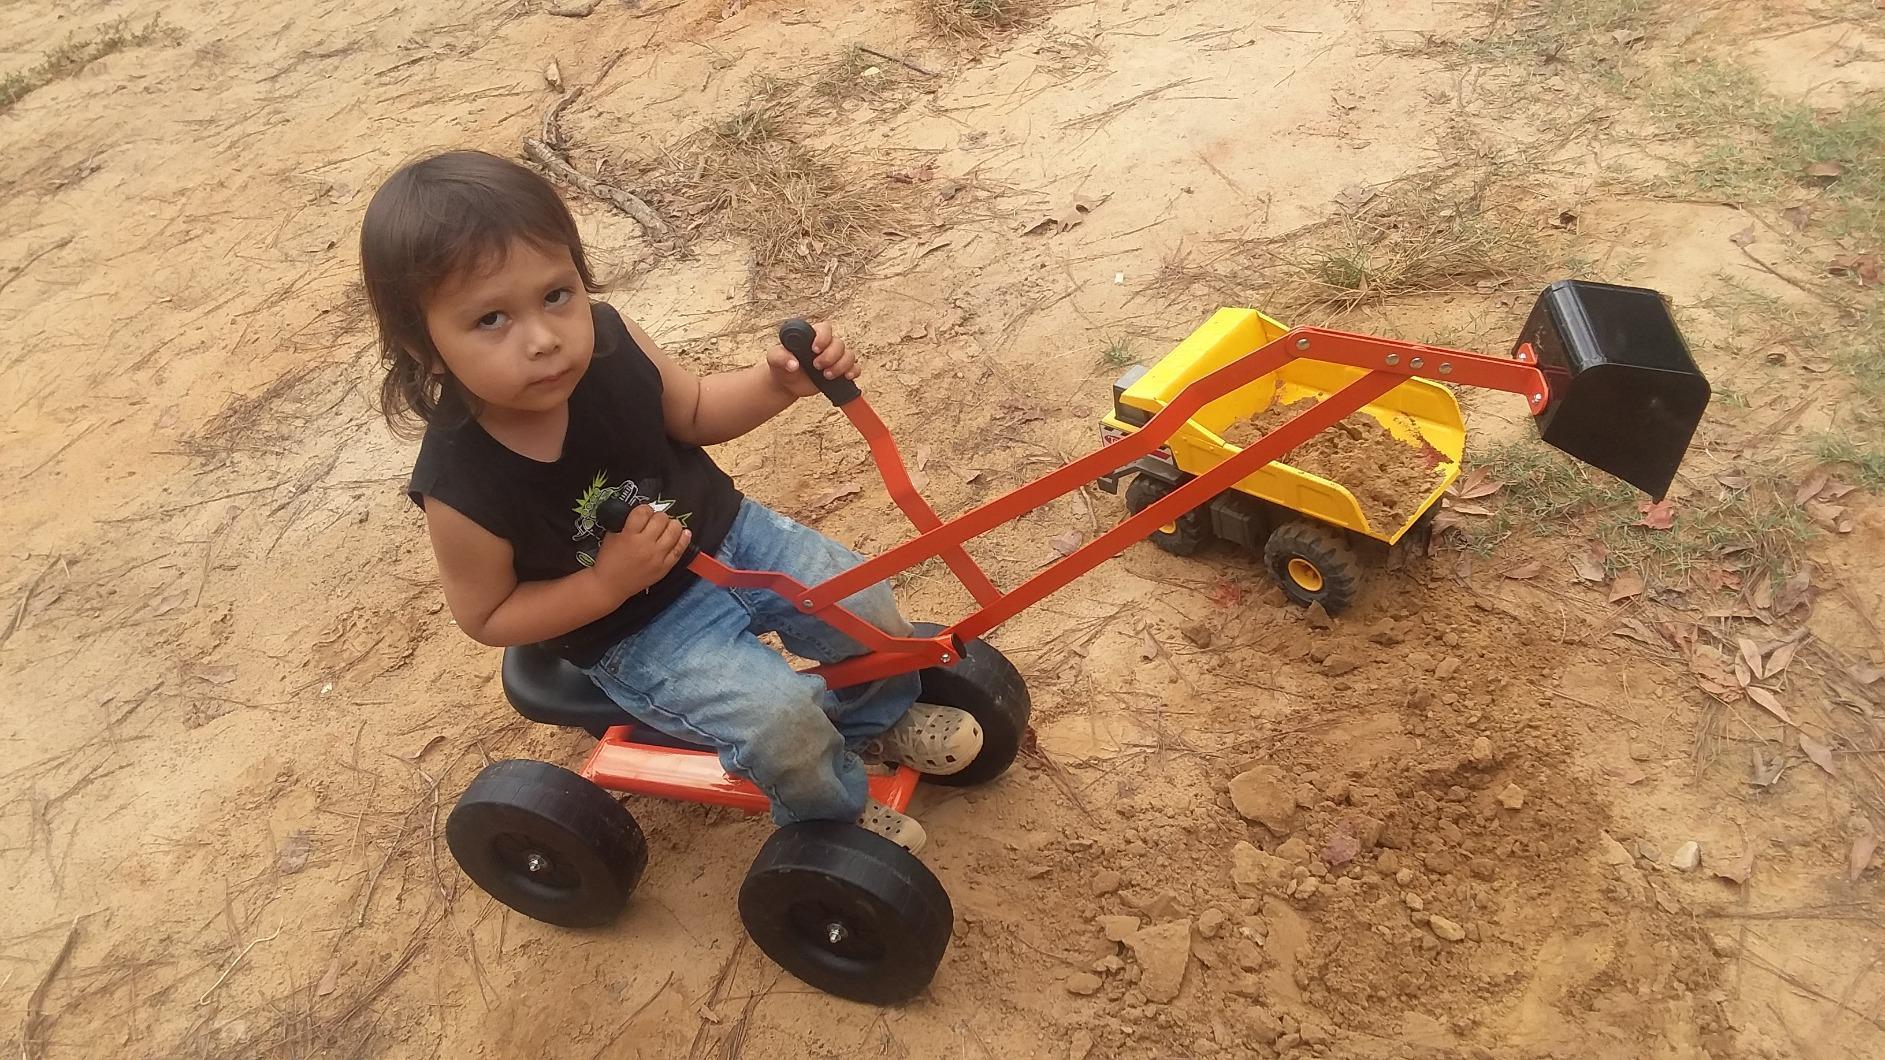 Kids Ride On Sandbox Digger Toys Little Sandbox Excavator for Boys and Girls, Orange photo review